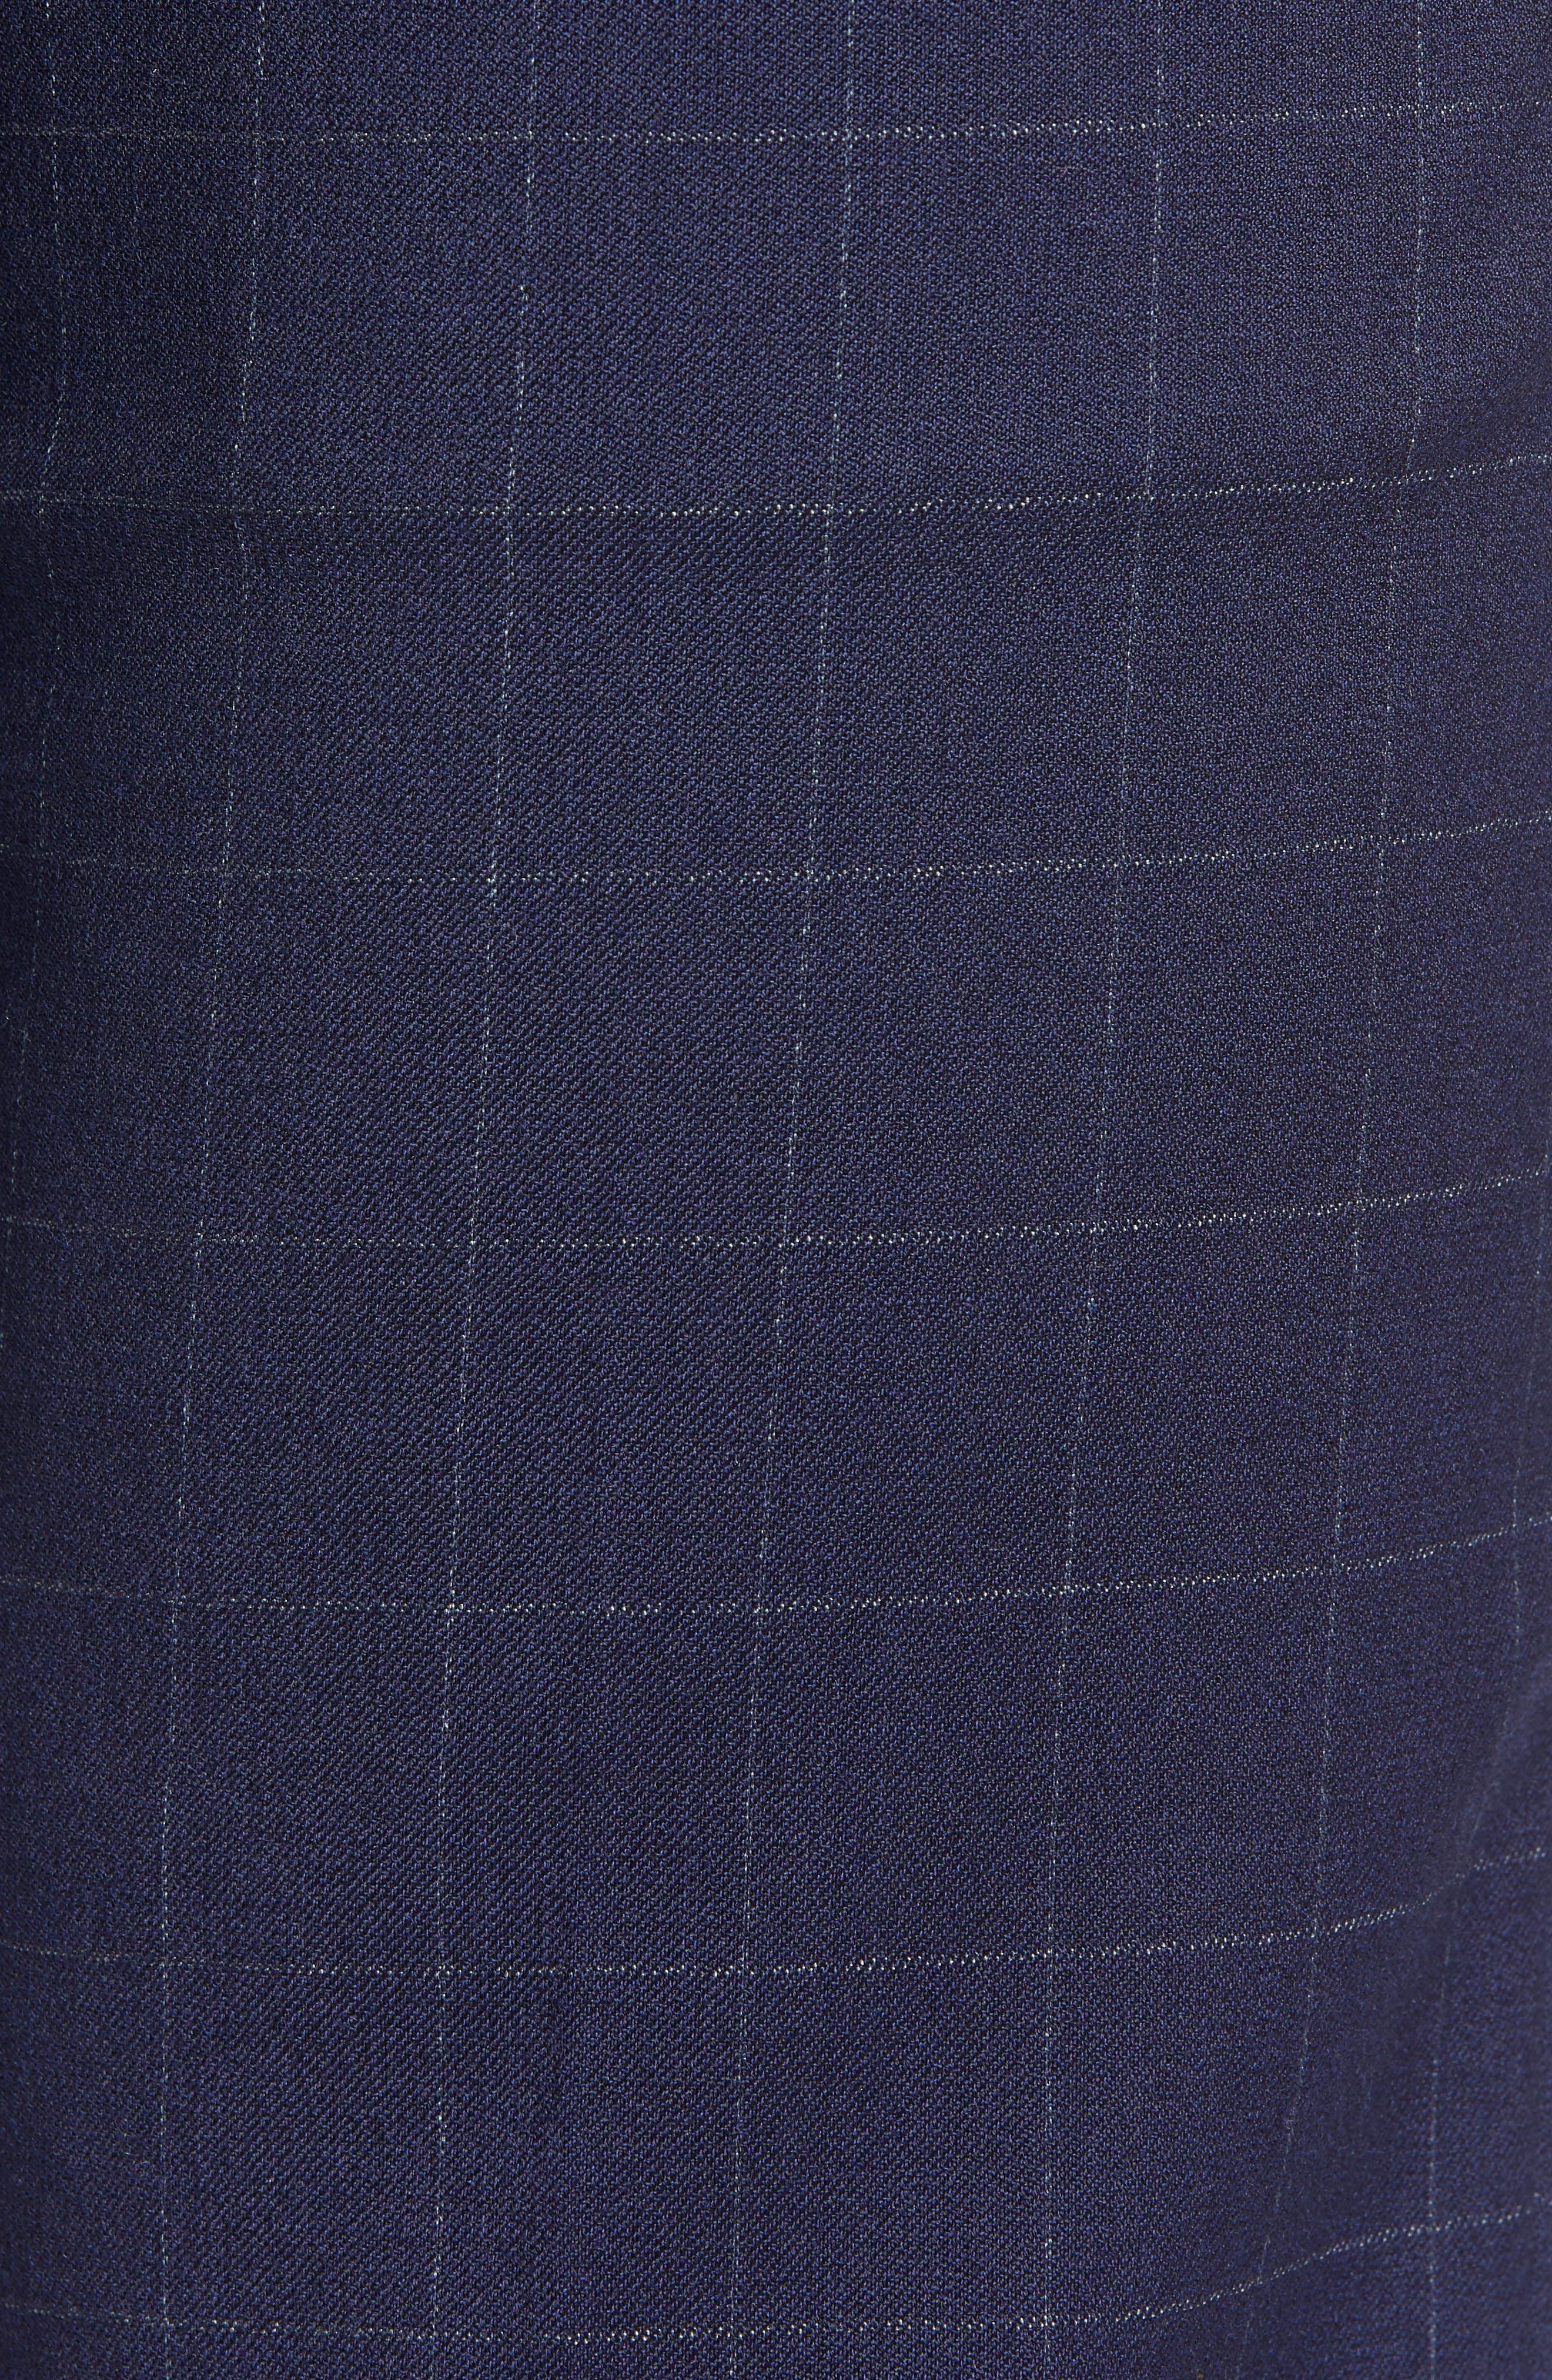 Jetsetter Slim Fit Stretch Suit Pants,                             Alternate thumbnail 5, color,                             NAVY CHALK WINDOWPANE